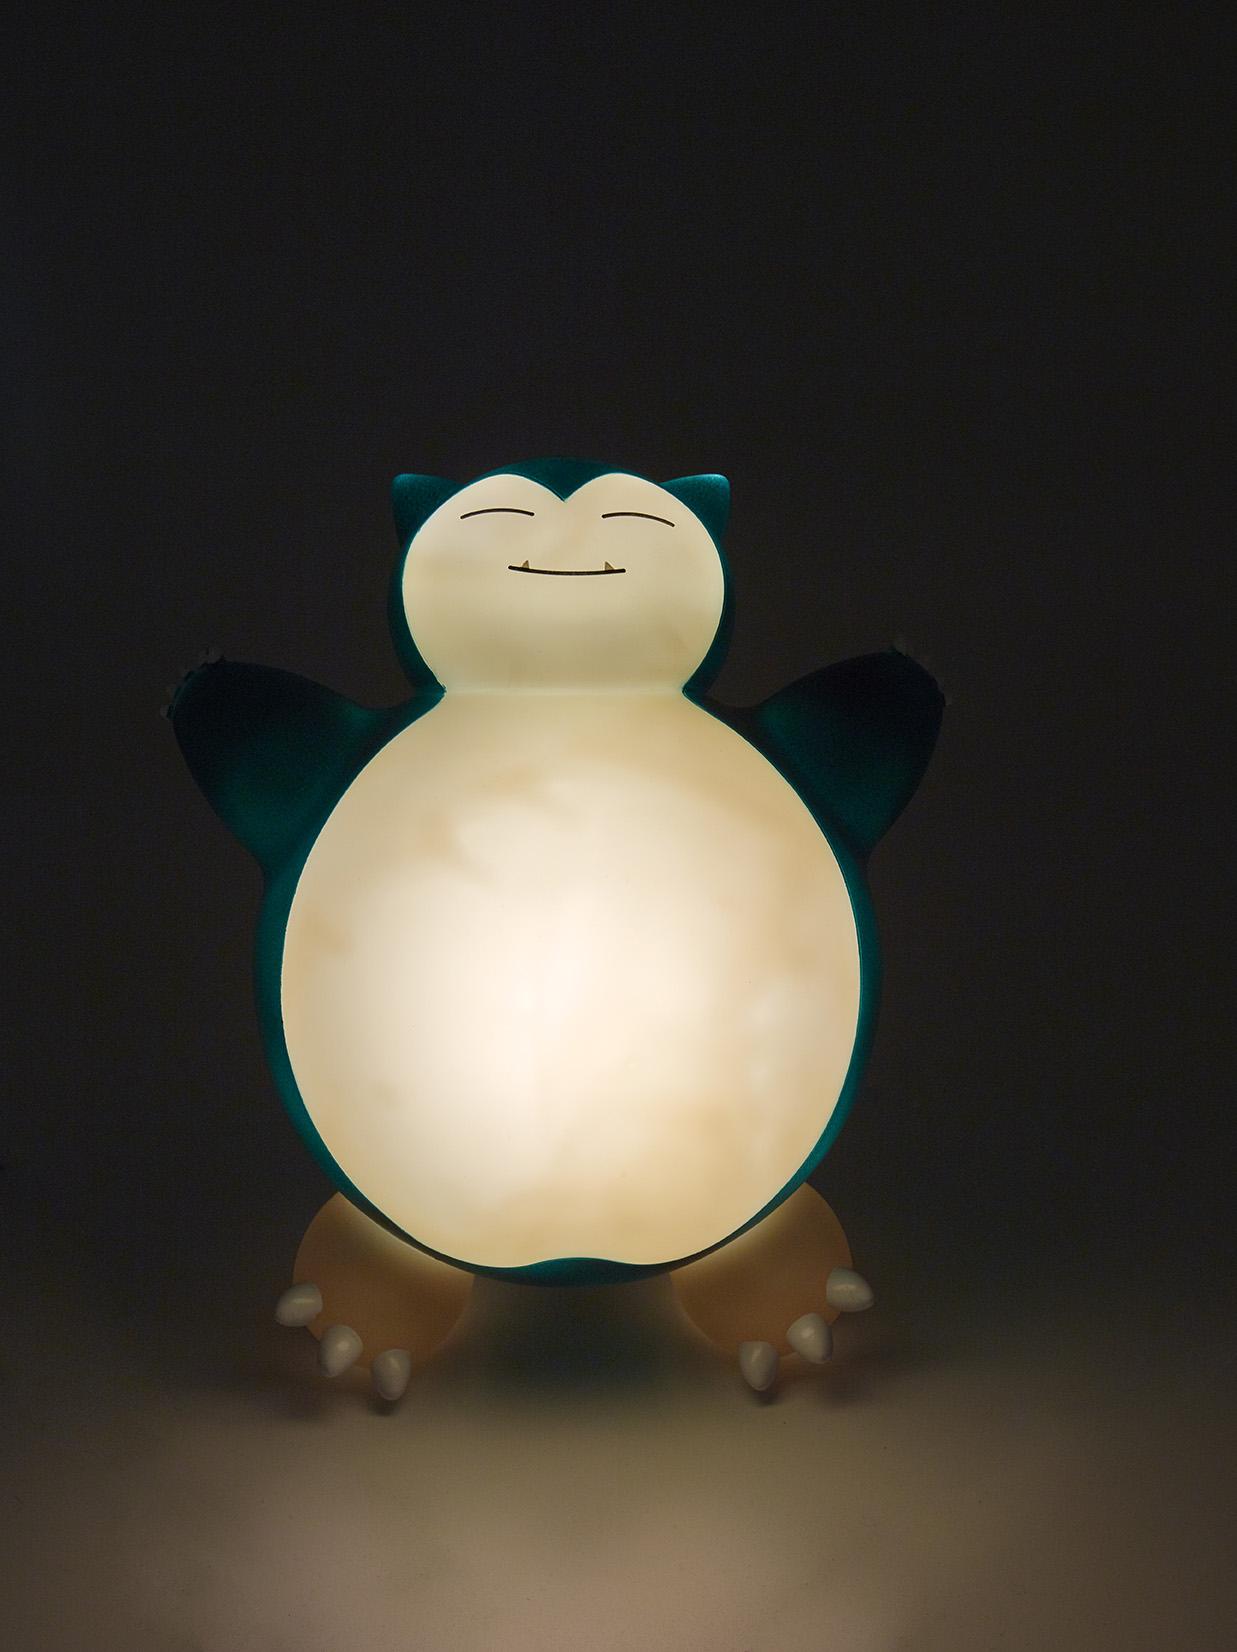 Pokémon snorlax led lamp night view